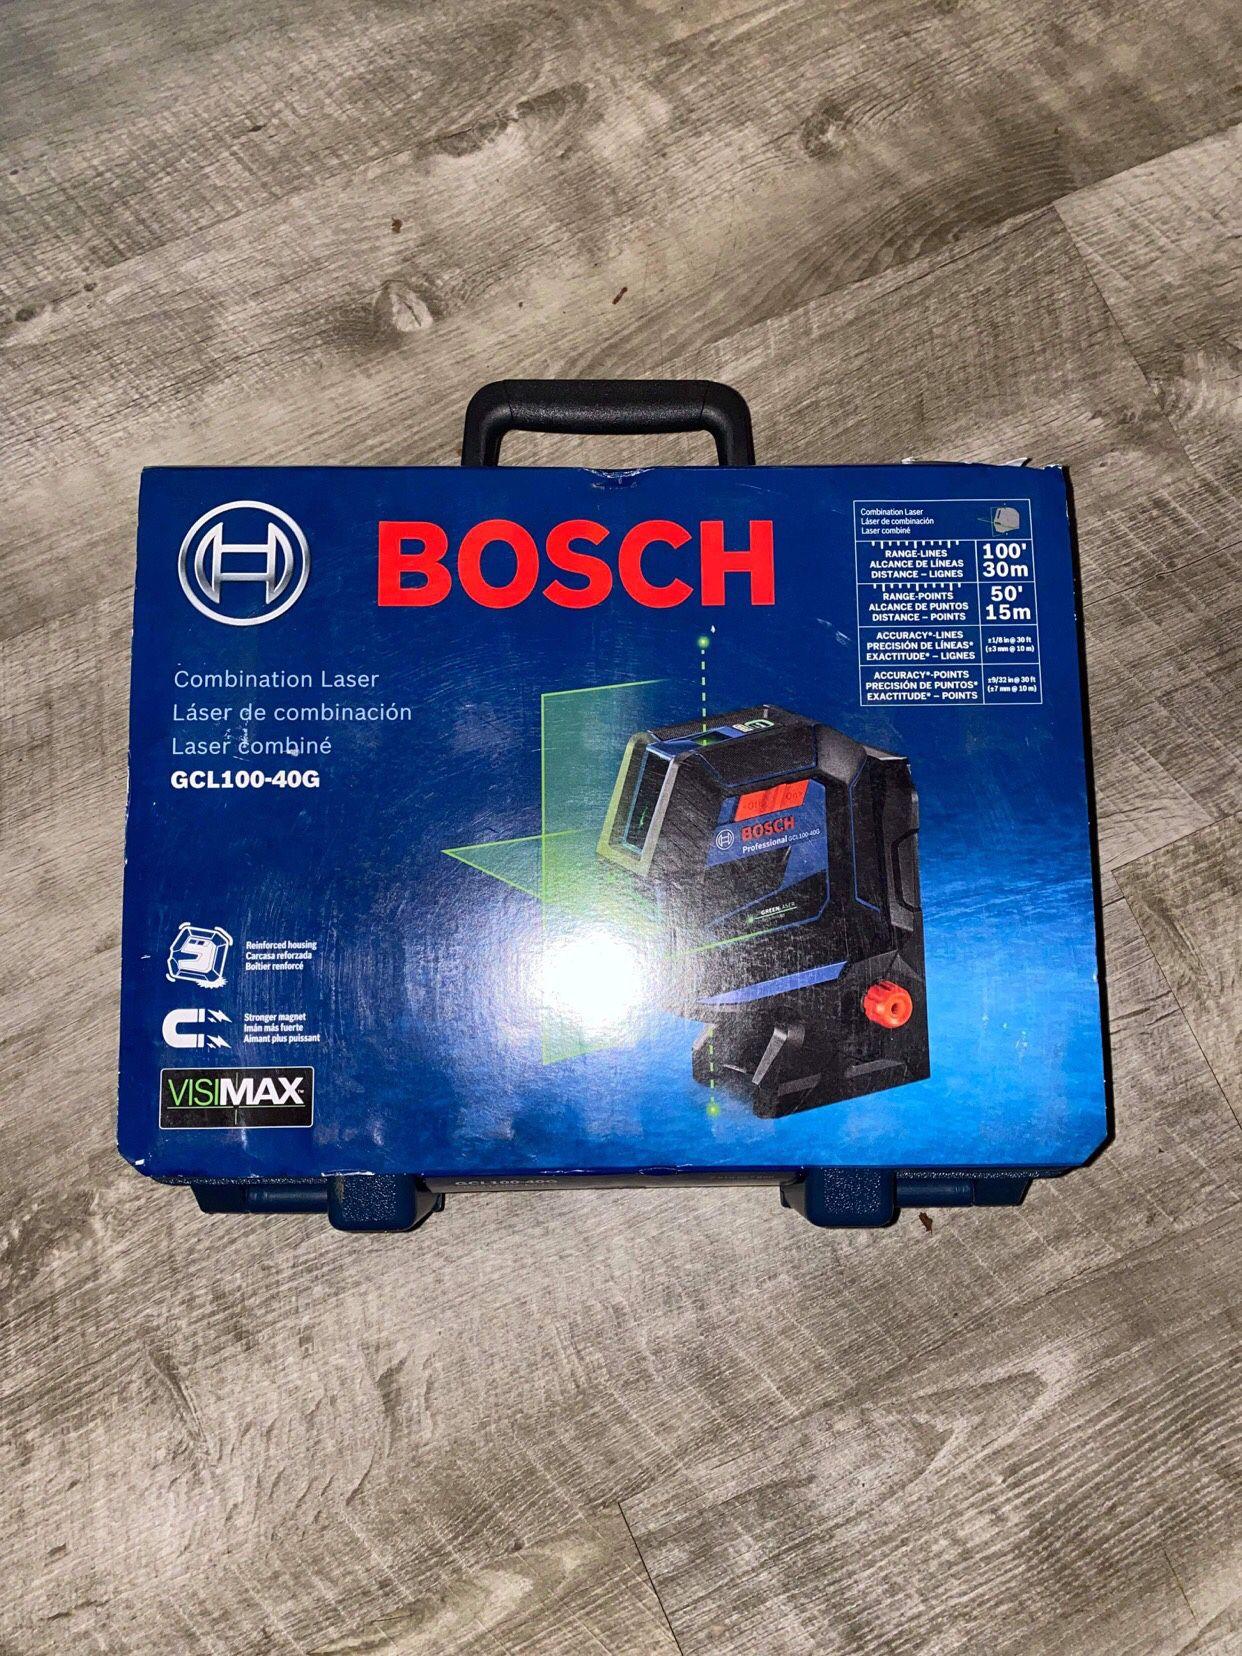 Bosch Combination Laser New